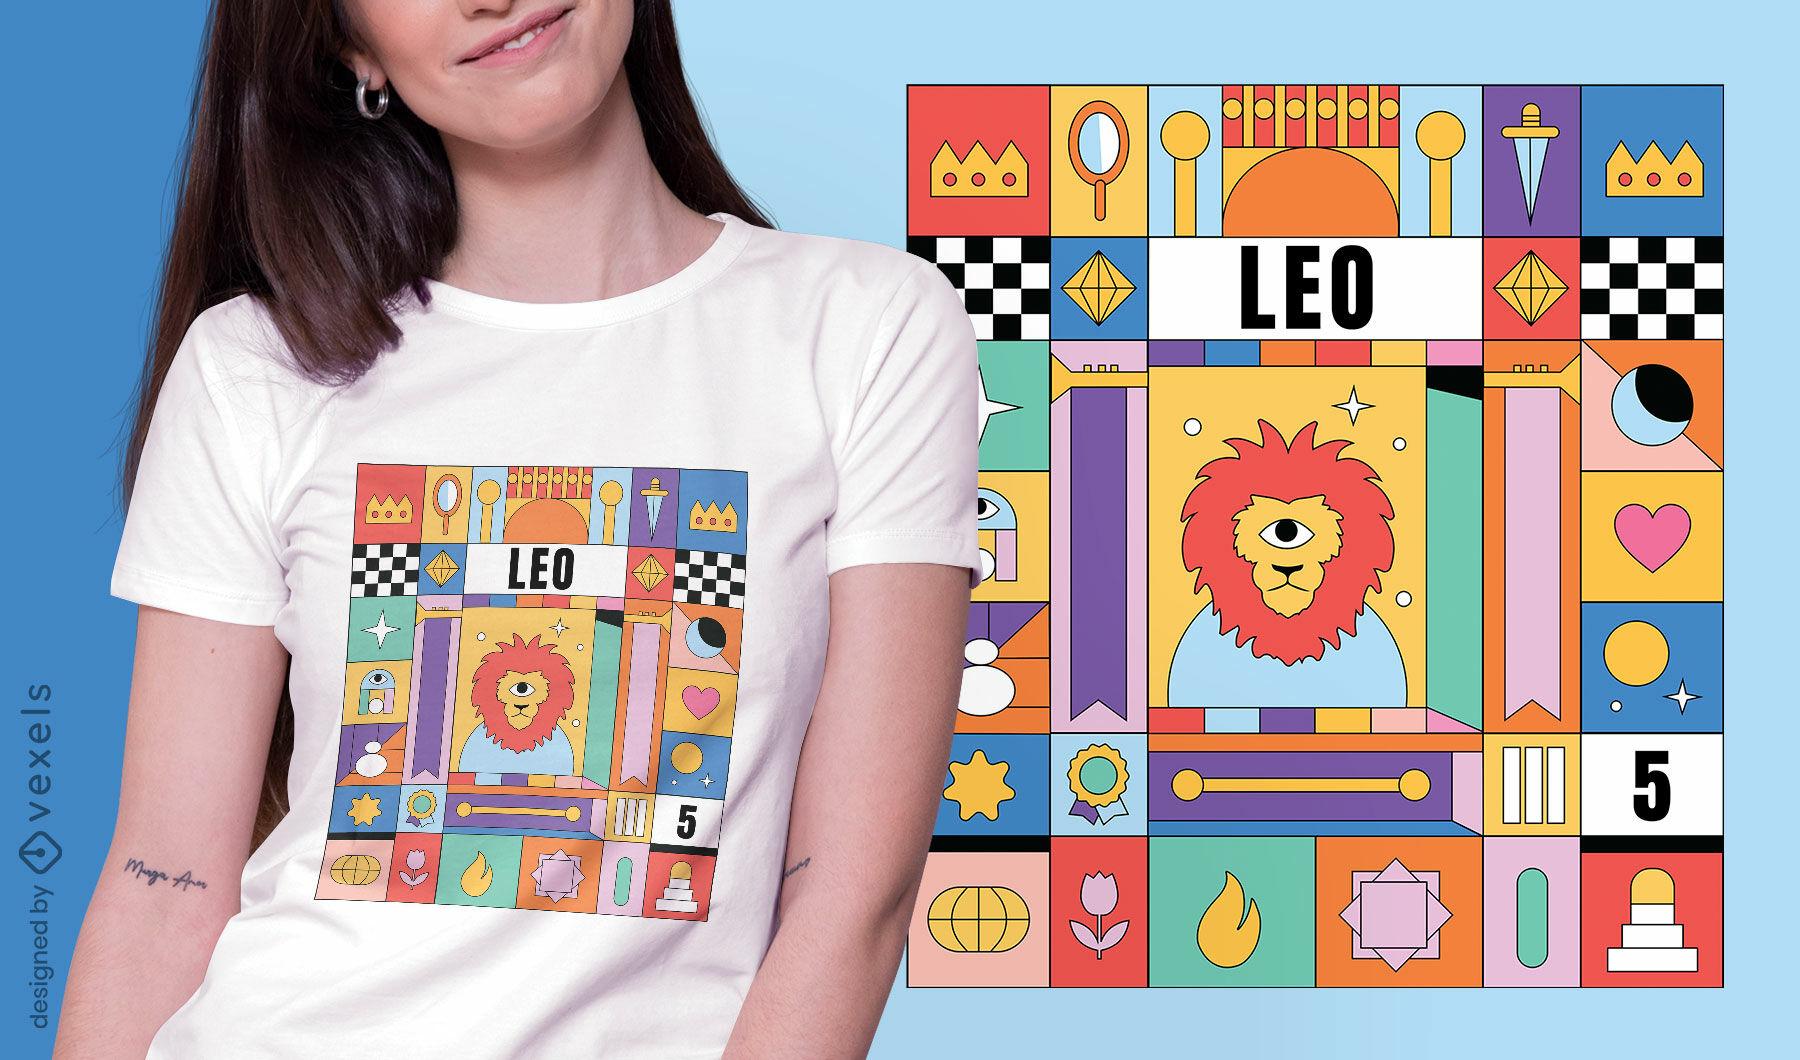 Leo colorful zodiac sign t-shirt design